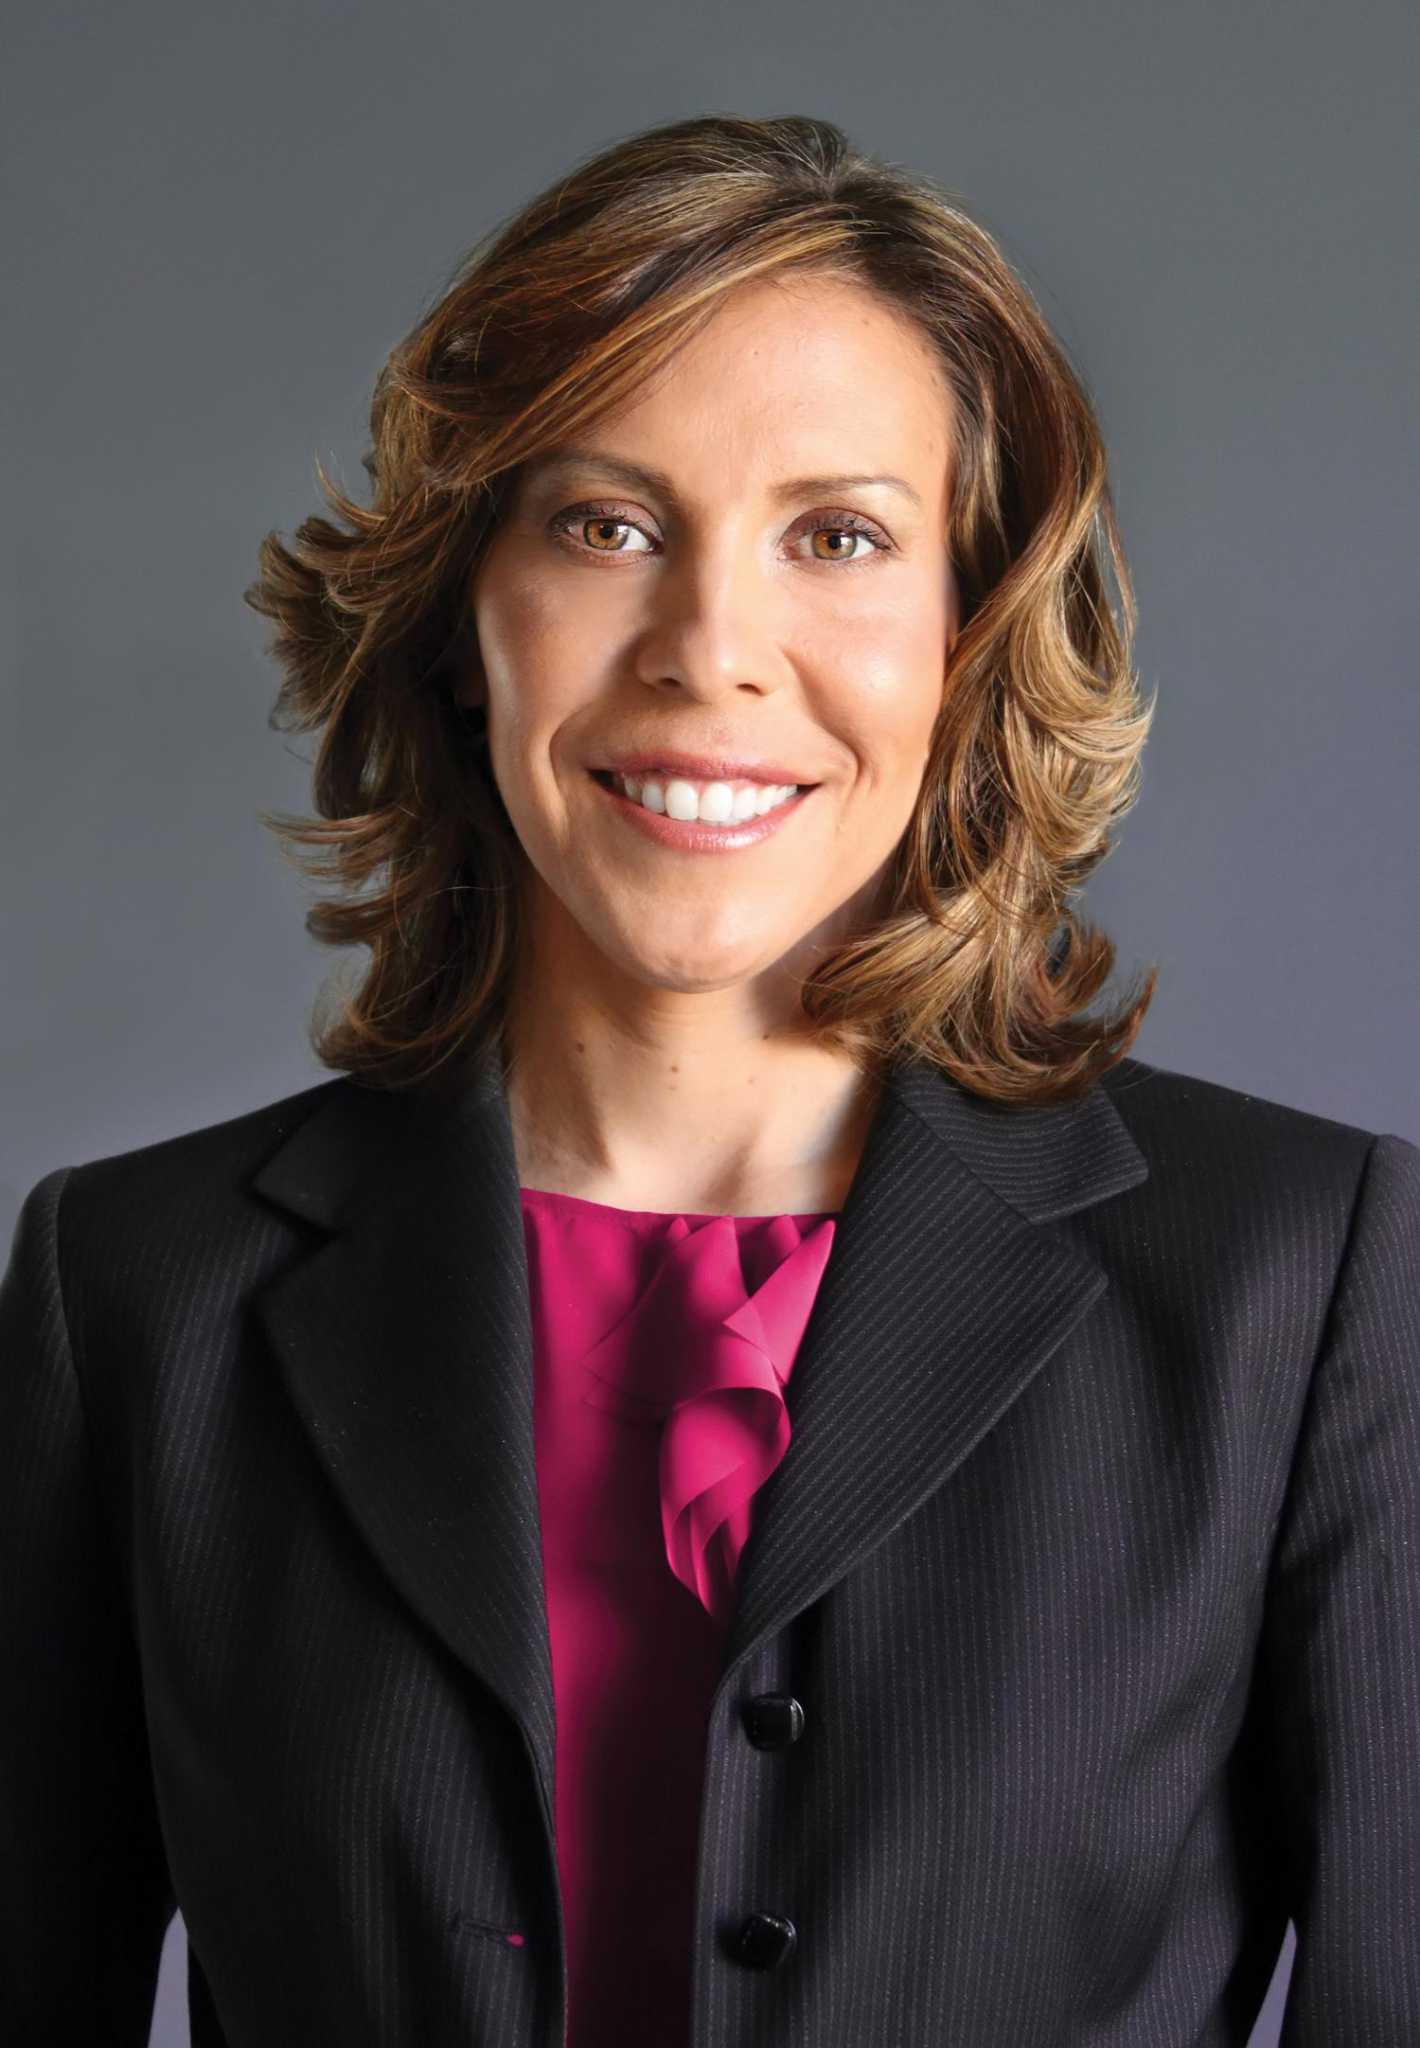 San Antonio looking at ways to minimize gender pay gap